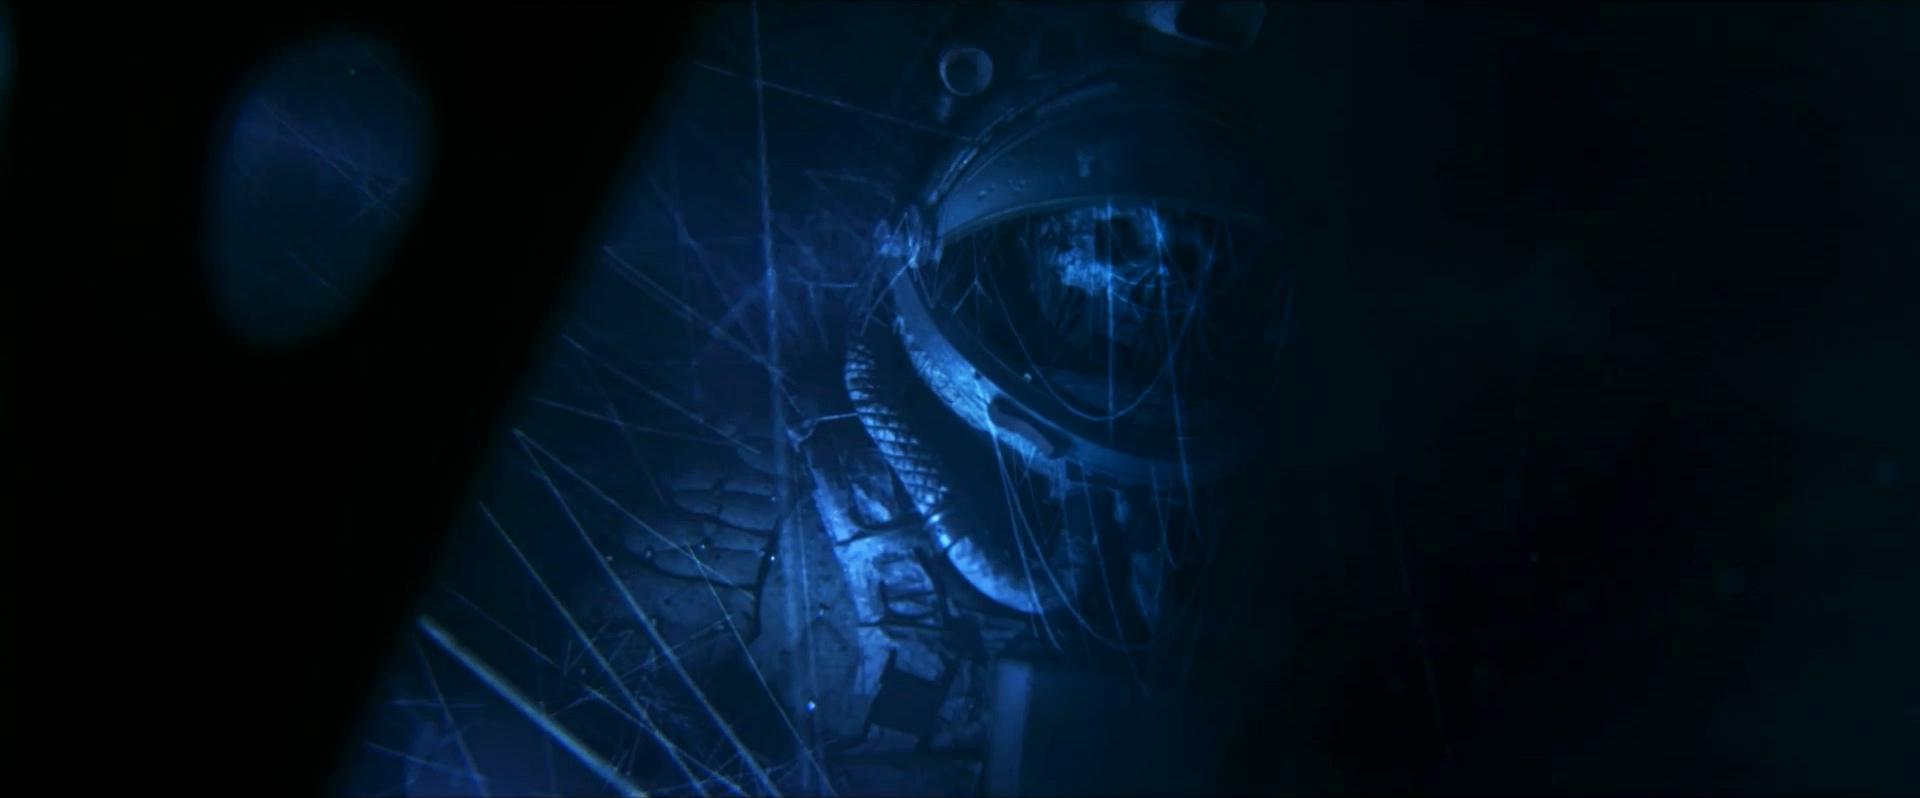 amazingly-cool-sci-fi-short-film-azarkant-4.jpg